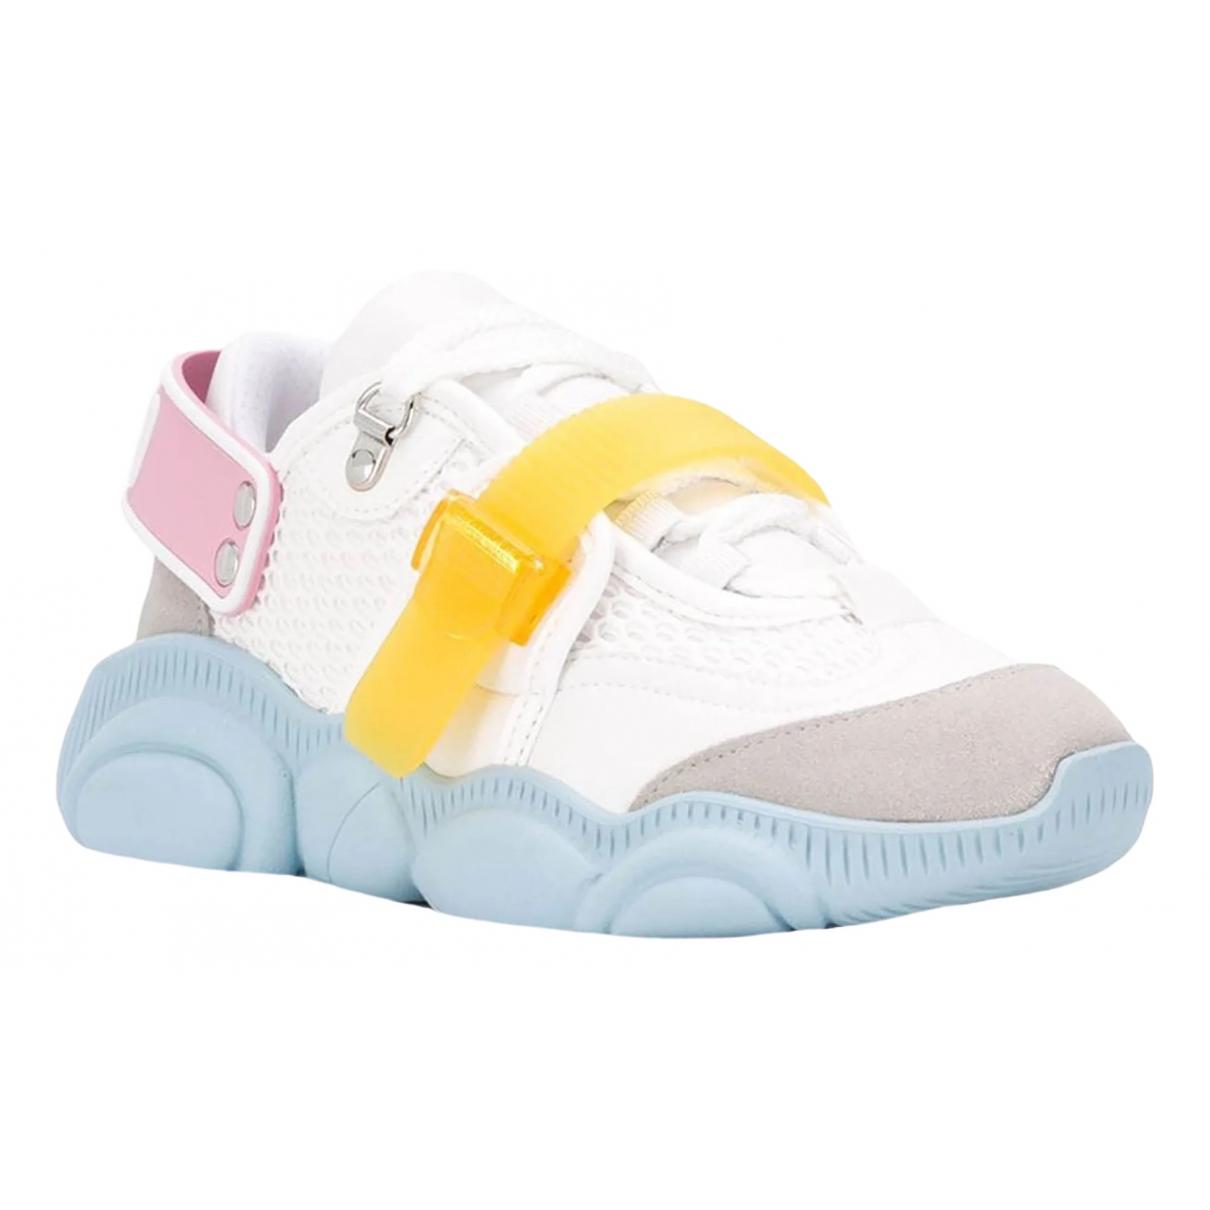 Moschino - Baskets   pour femme - multicolore